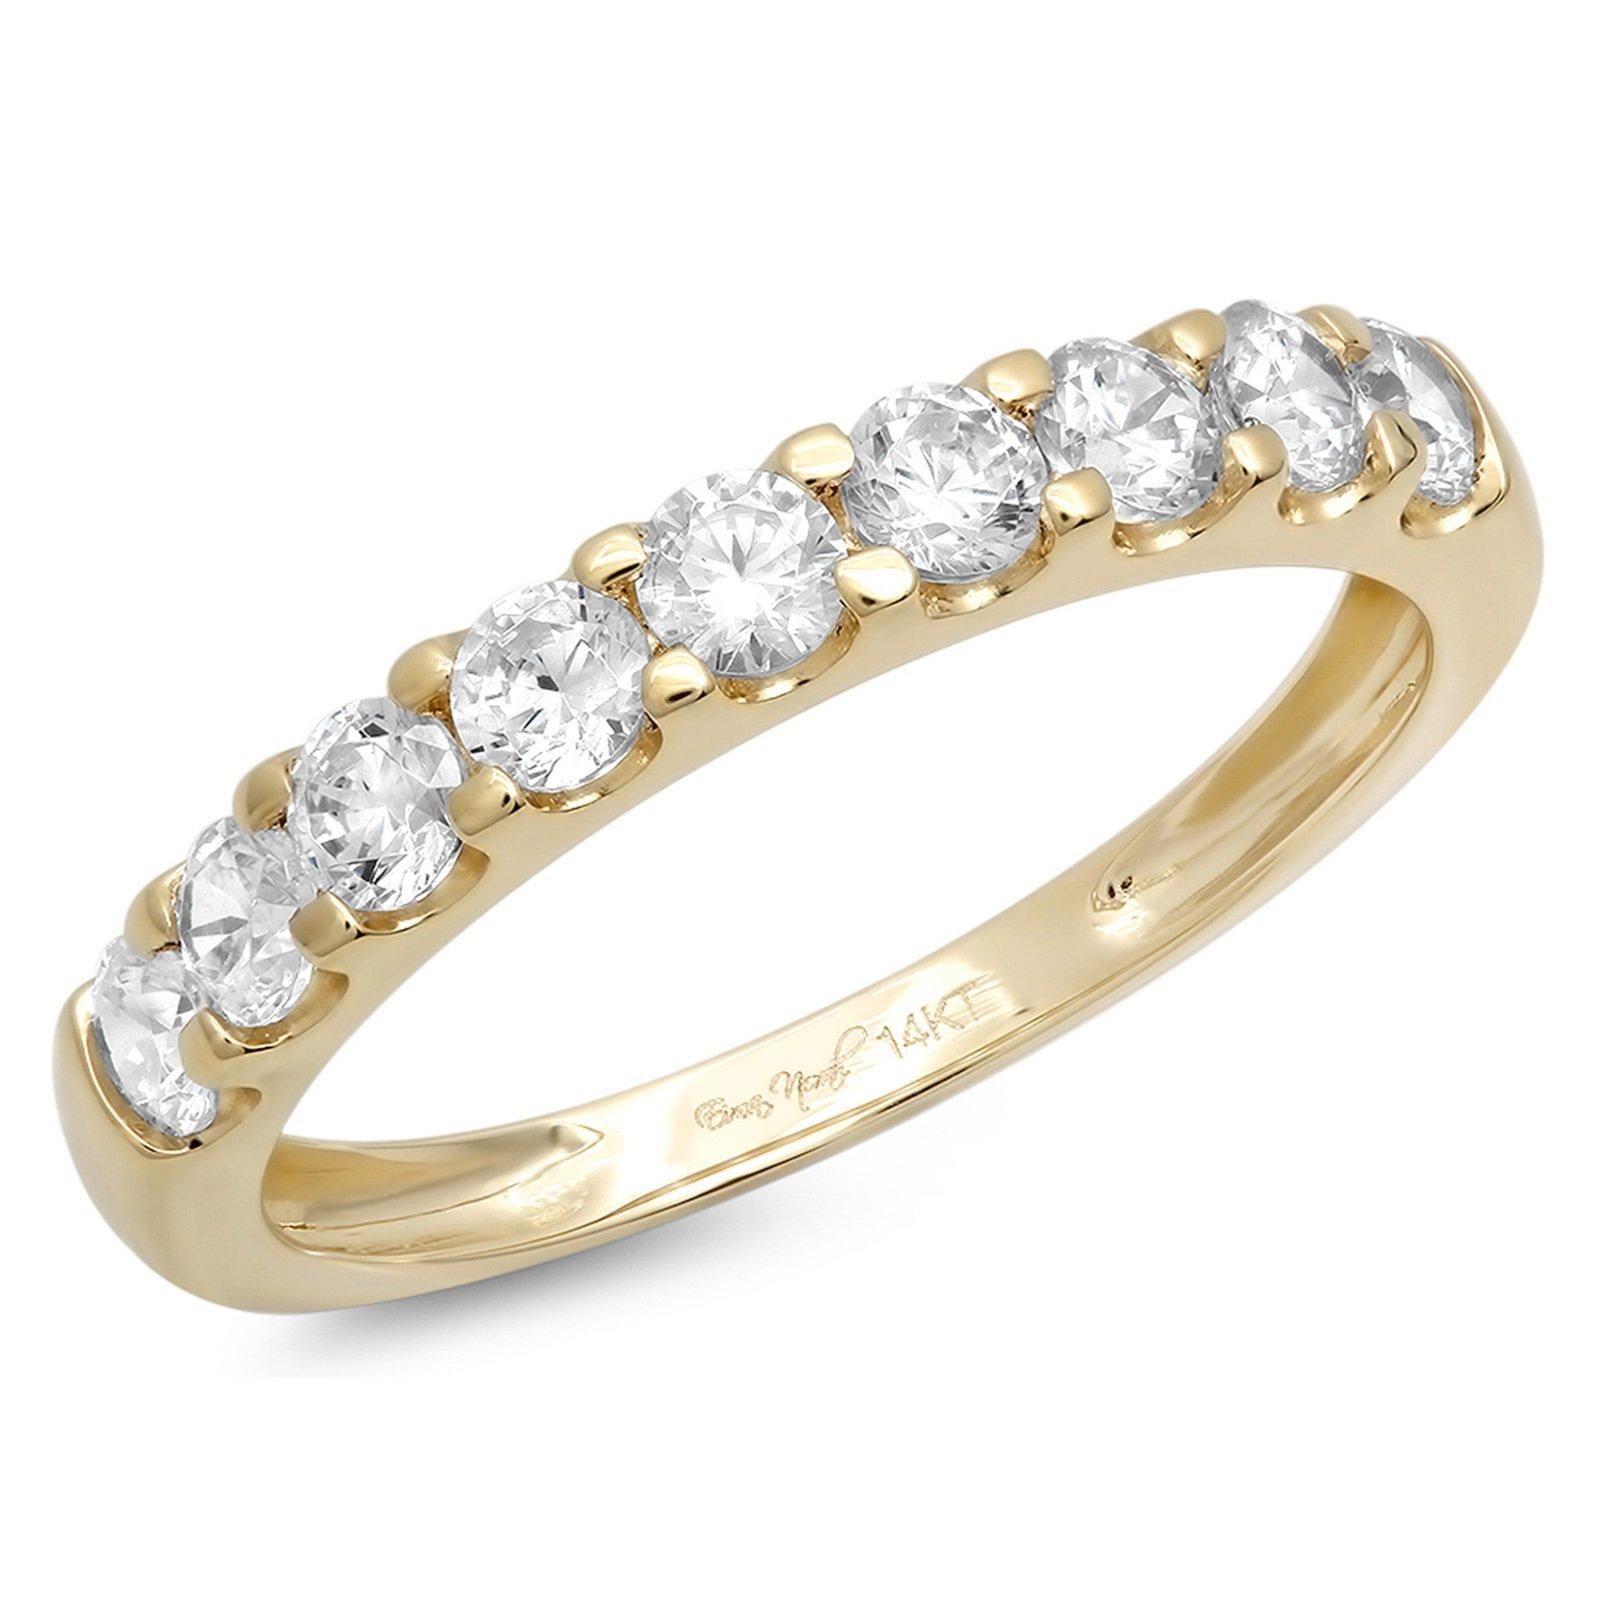 1.2 Ct Round Cut Designer Pave Engagement Wedding Bridal Anniversary Ring Band 14K Yellow Gold, Size 6.5, Clara Pucci